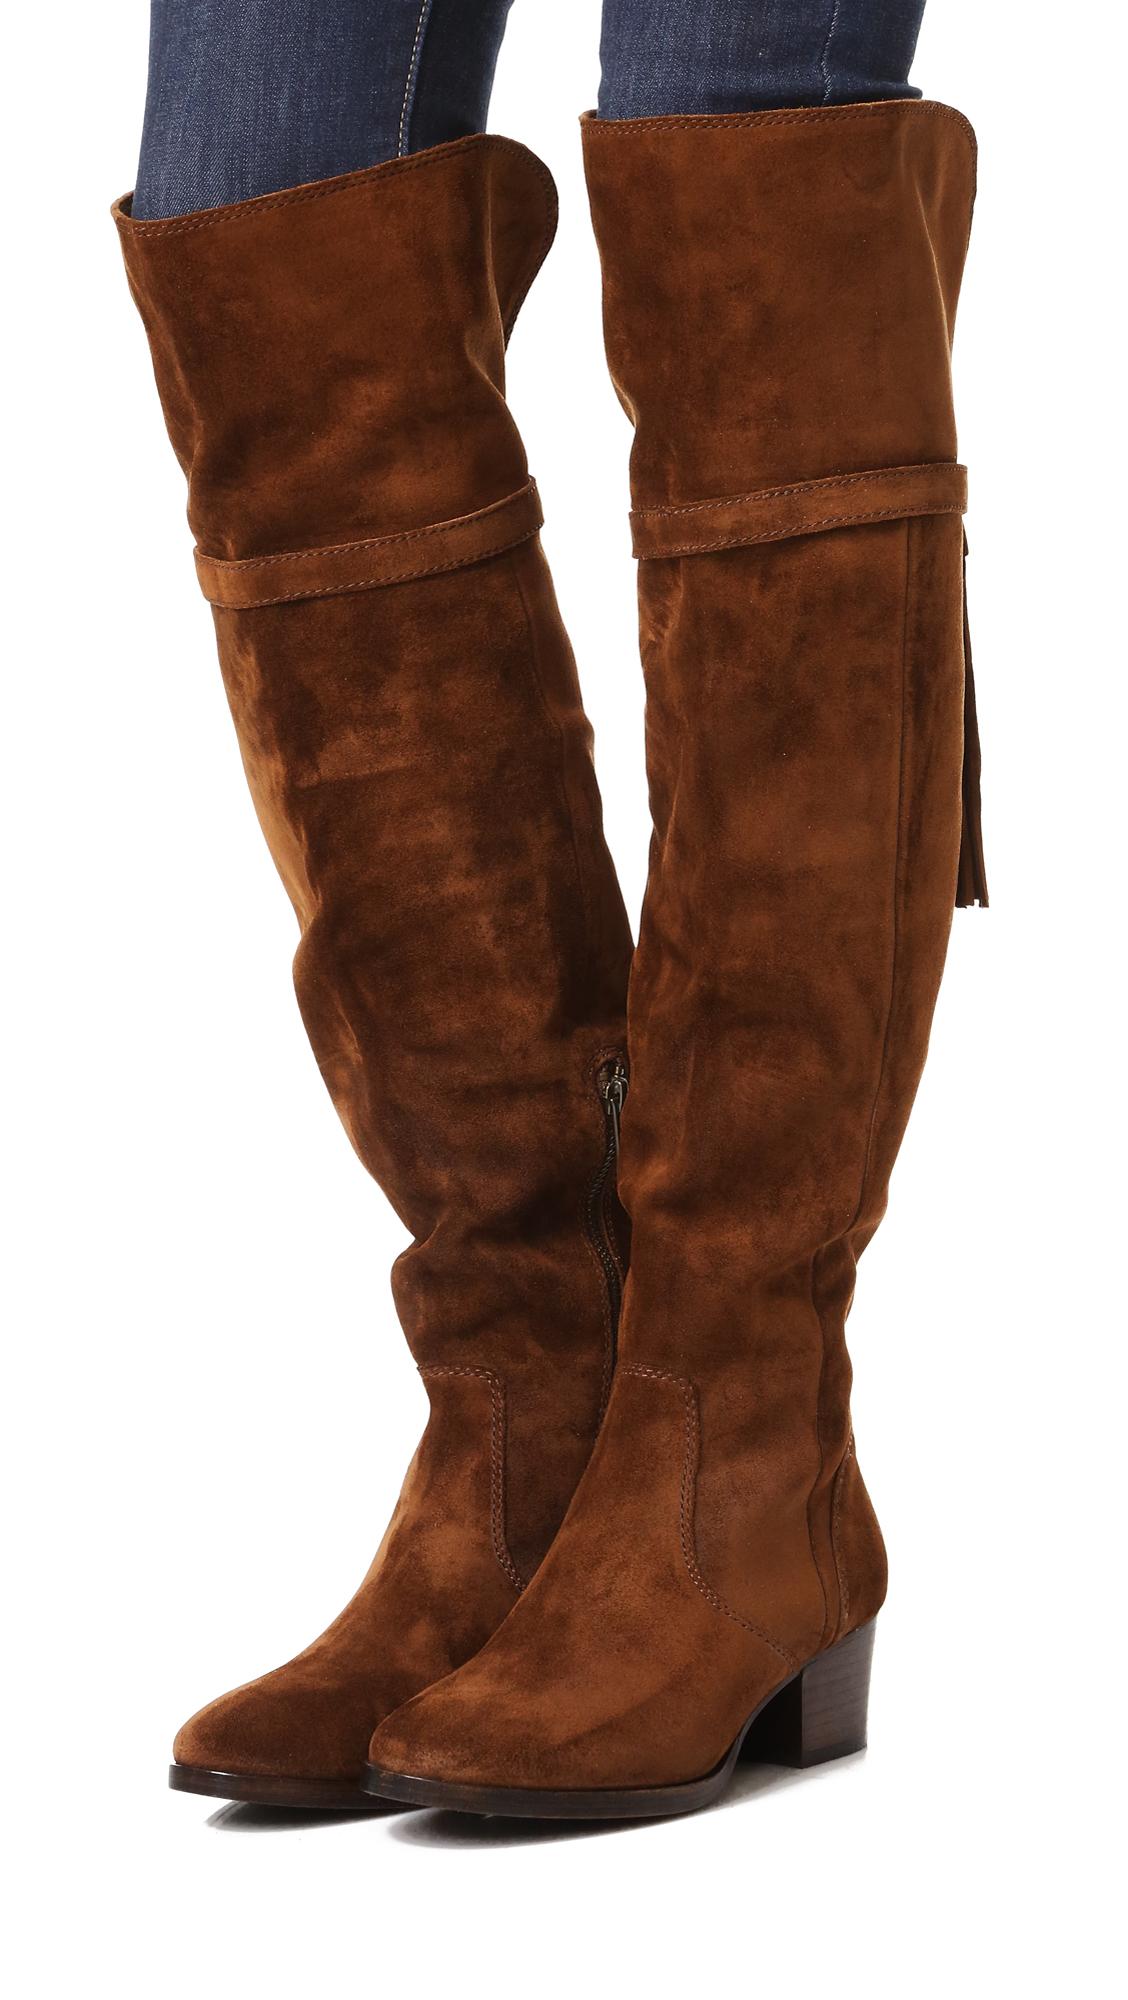 748640ed819 Frye Clara Tassel Over the Knee Boots